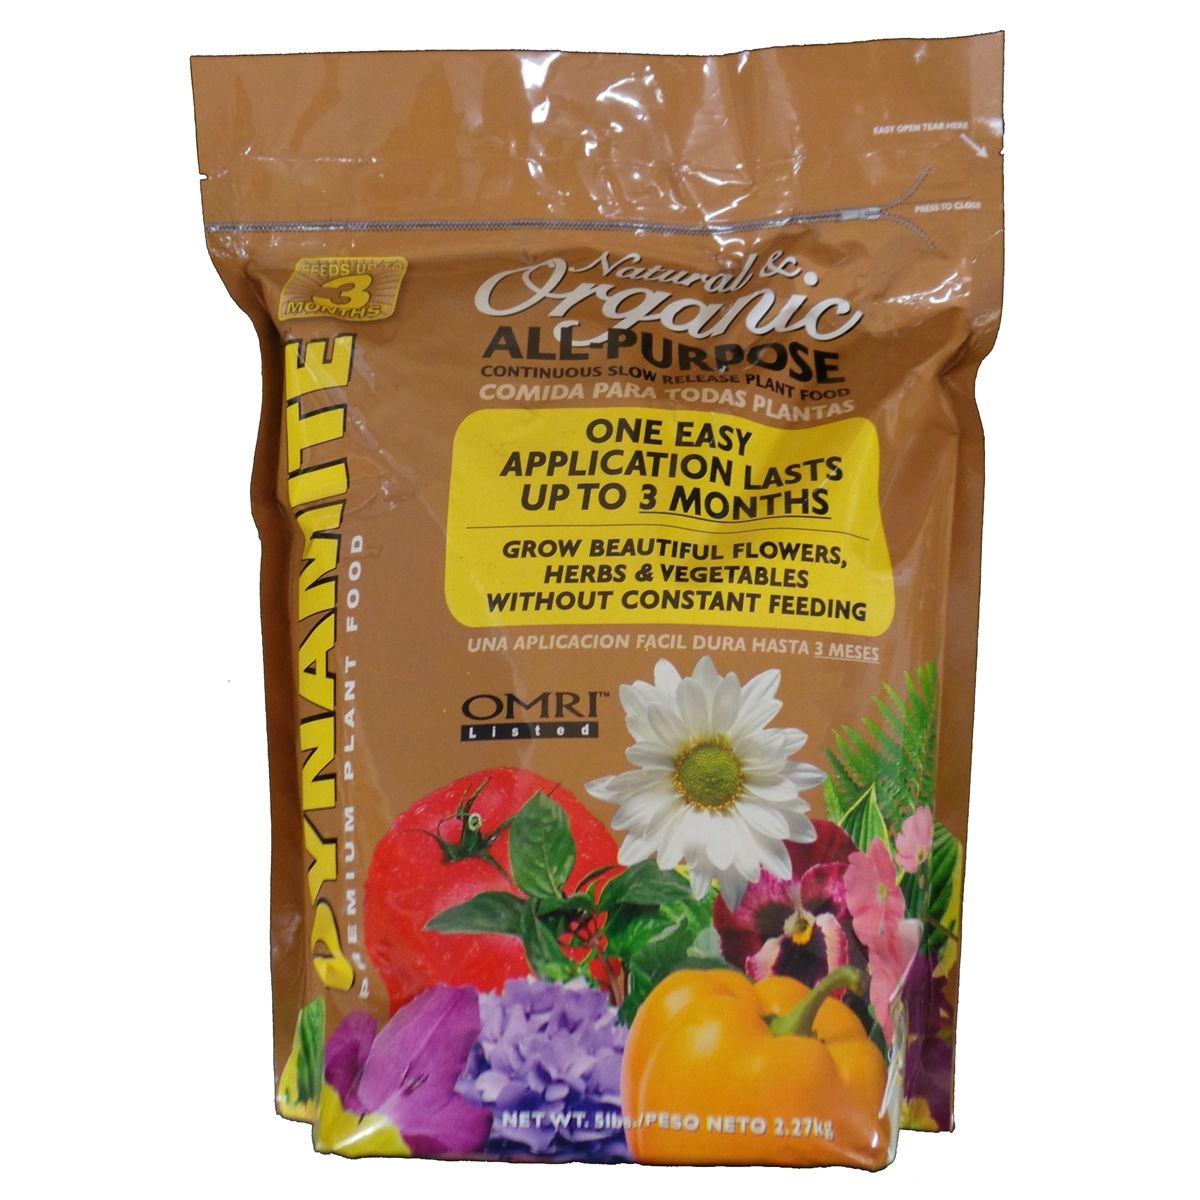 Dynamite All-Purpose Organic Plant Food 10-2-8 - 5 lbs.